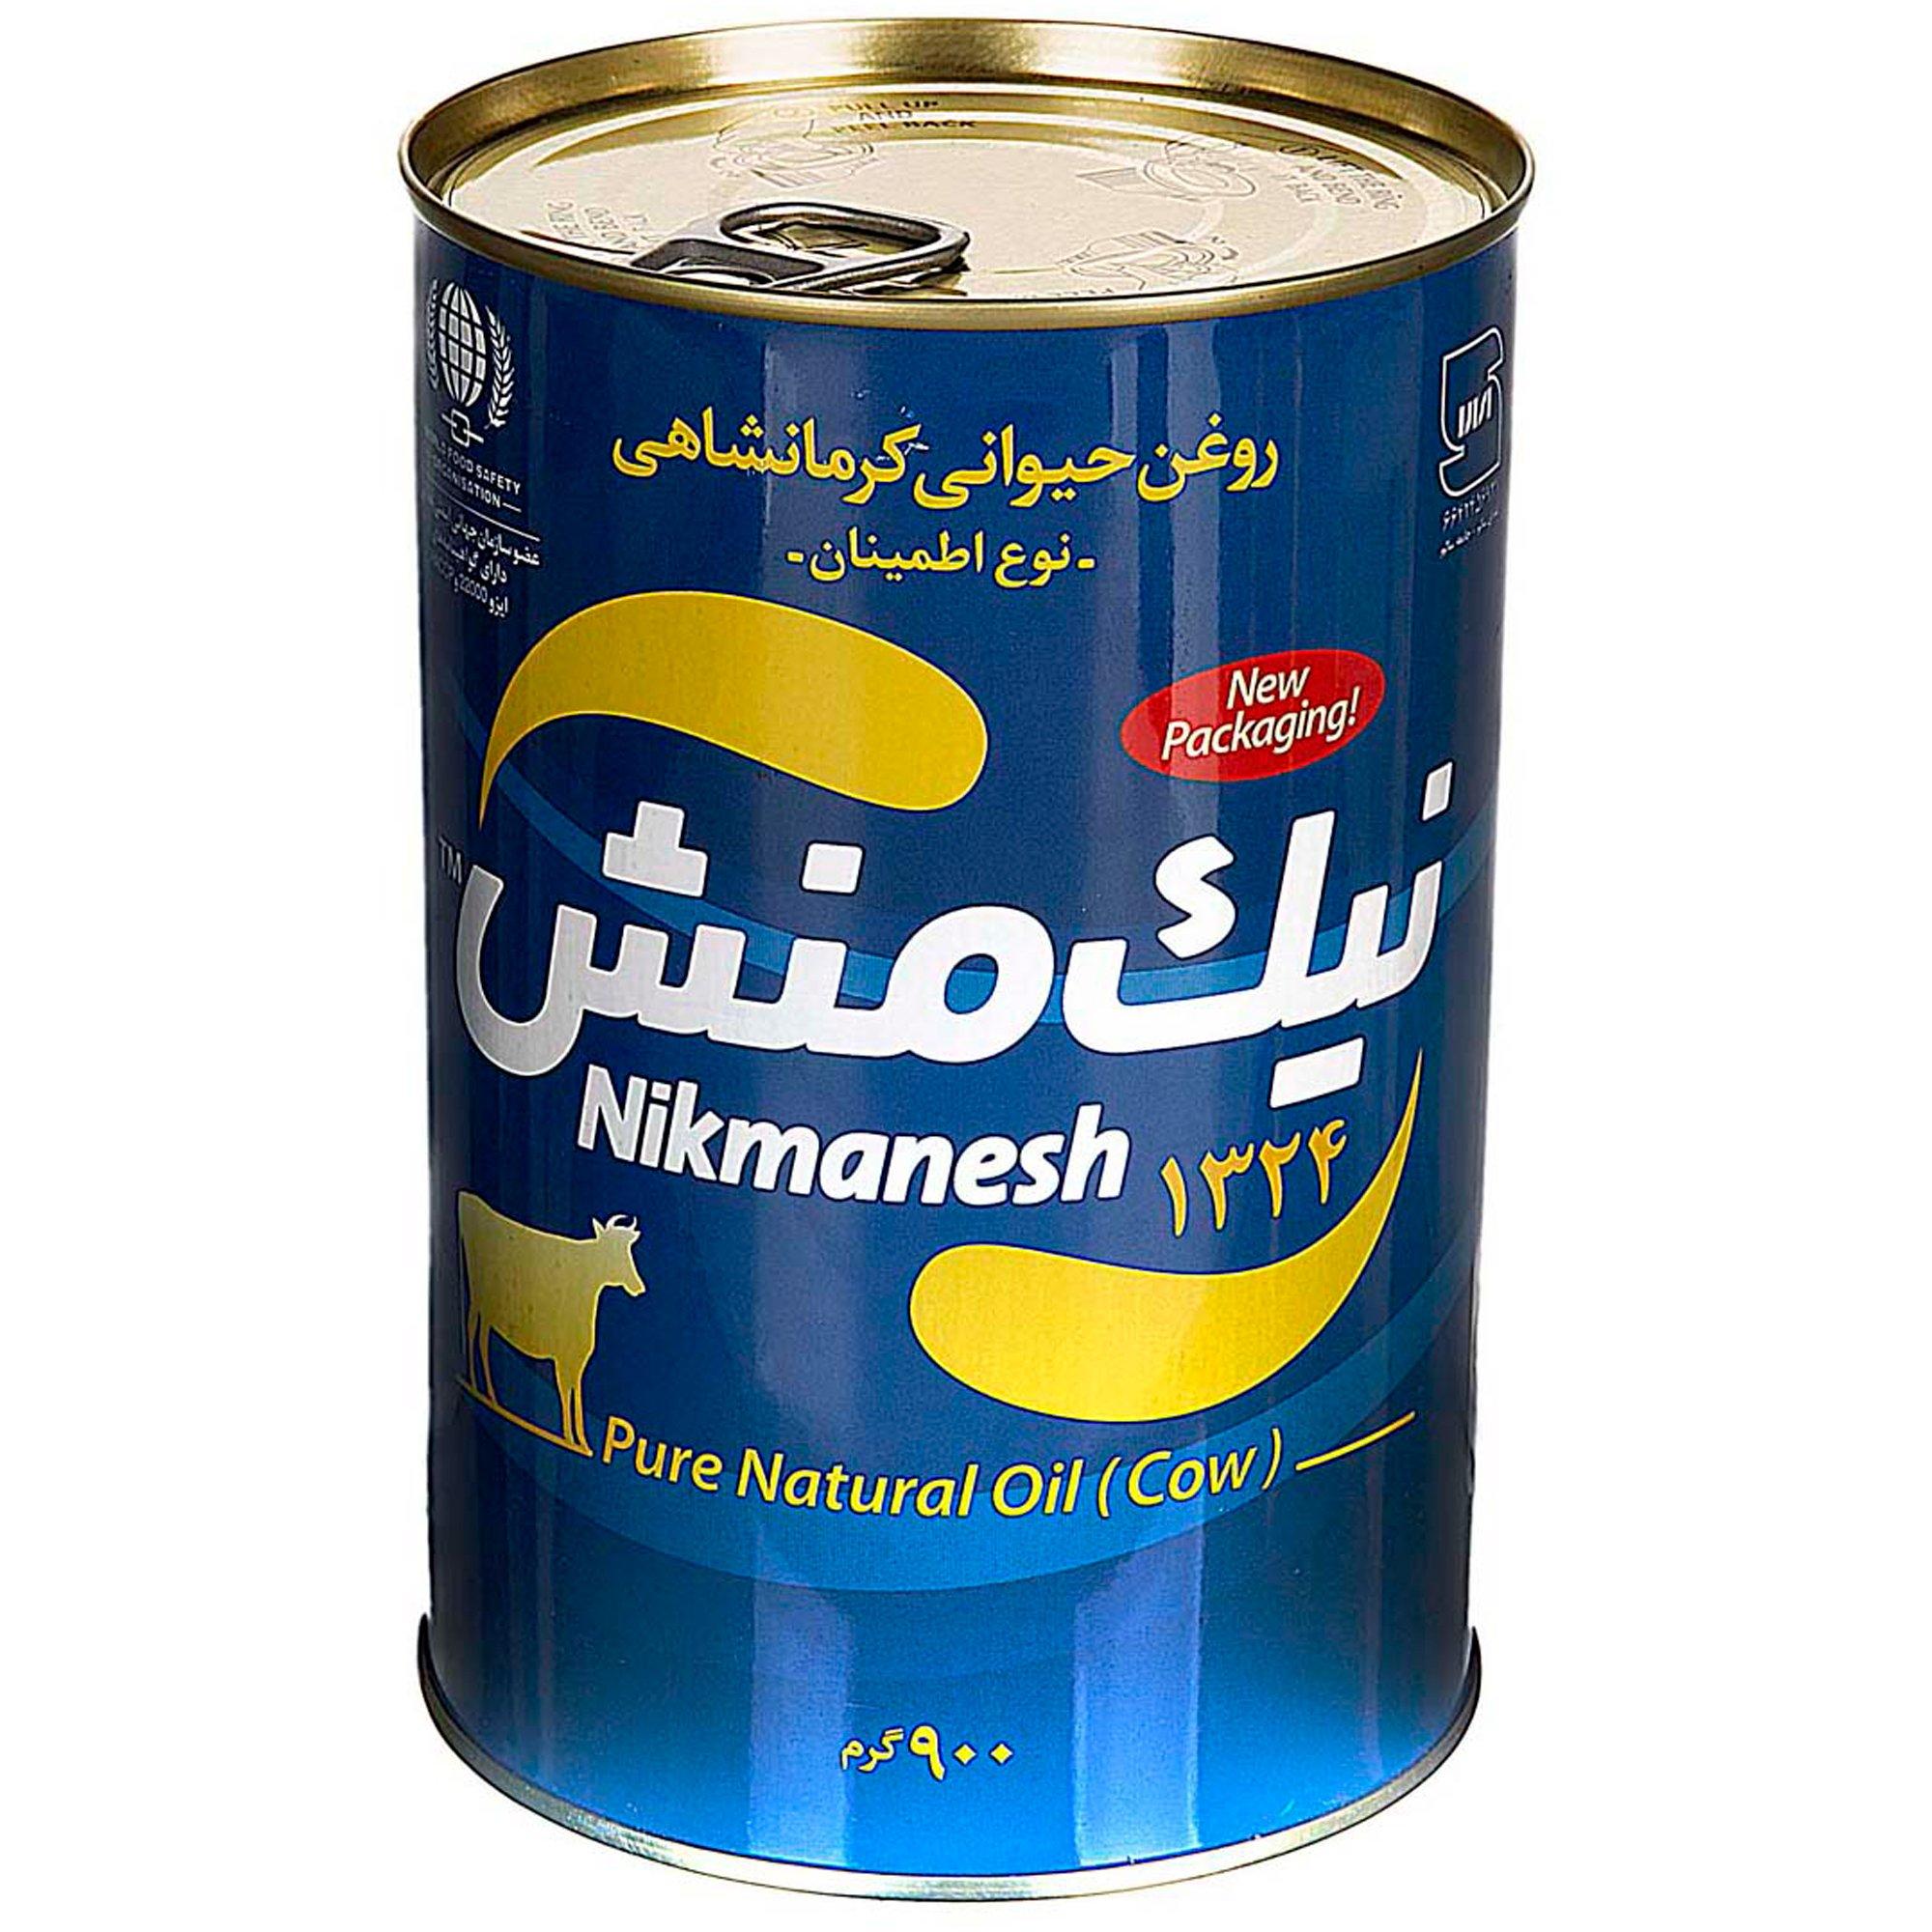 روغن حیوانی کرمانشاهی گاوی نیک منش ۹۰۰ گرمی